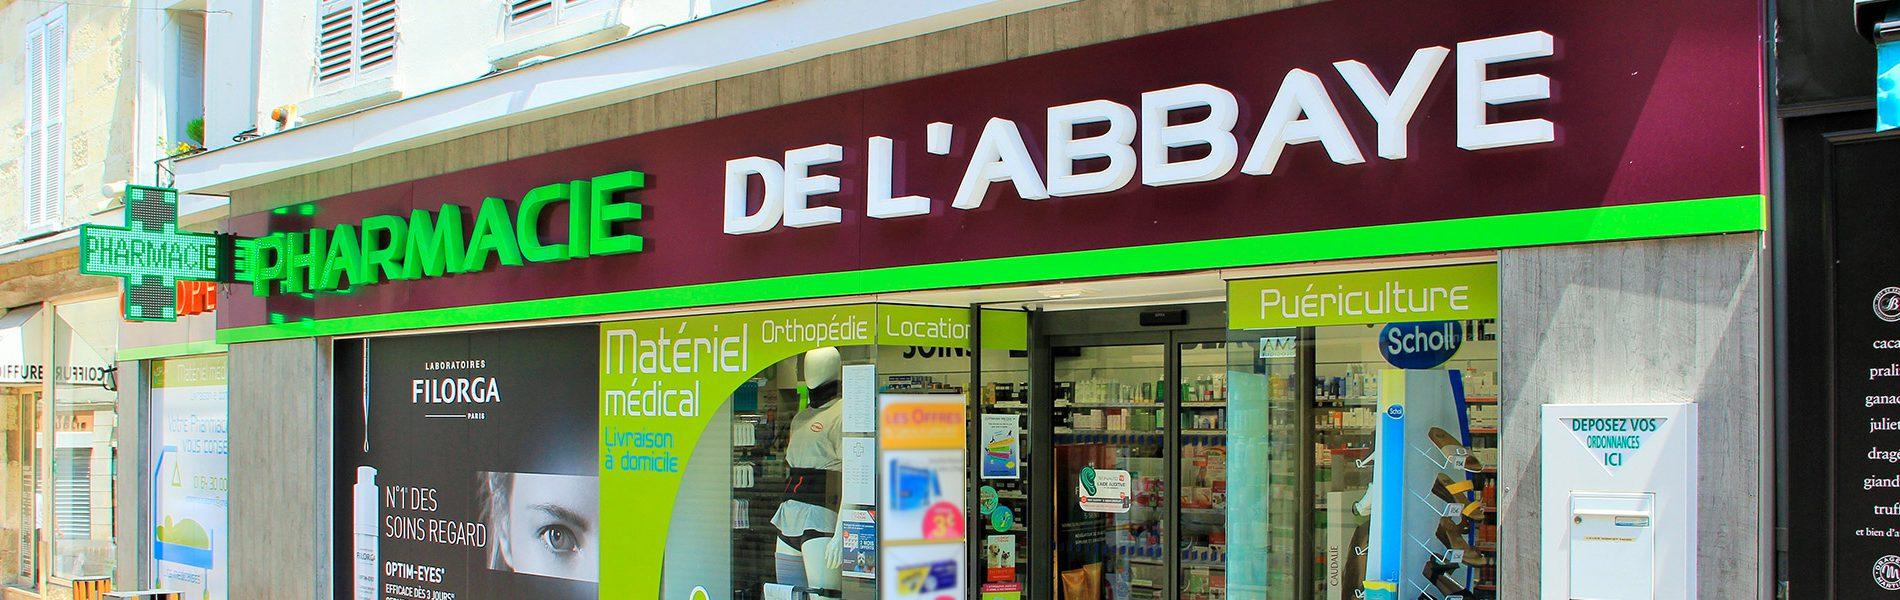 Pharmacie DE L'ABBAYE - Image Homepage 3